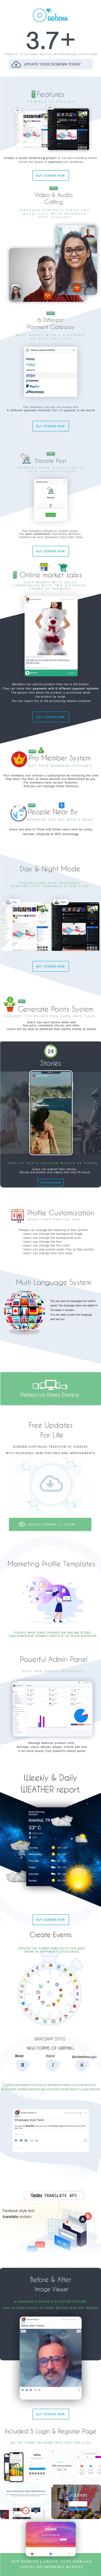 oobenn || Ultimate Instagram Style PHP Social Networking Platform - 1